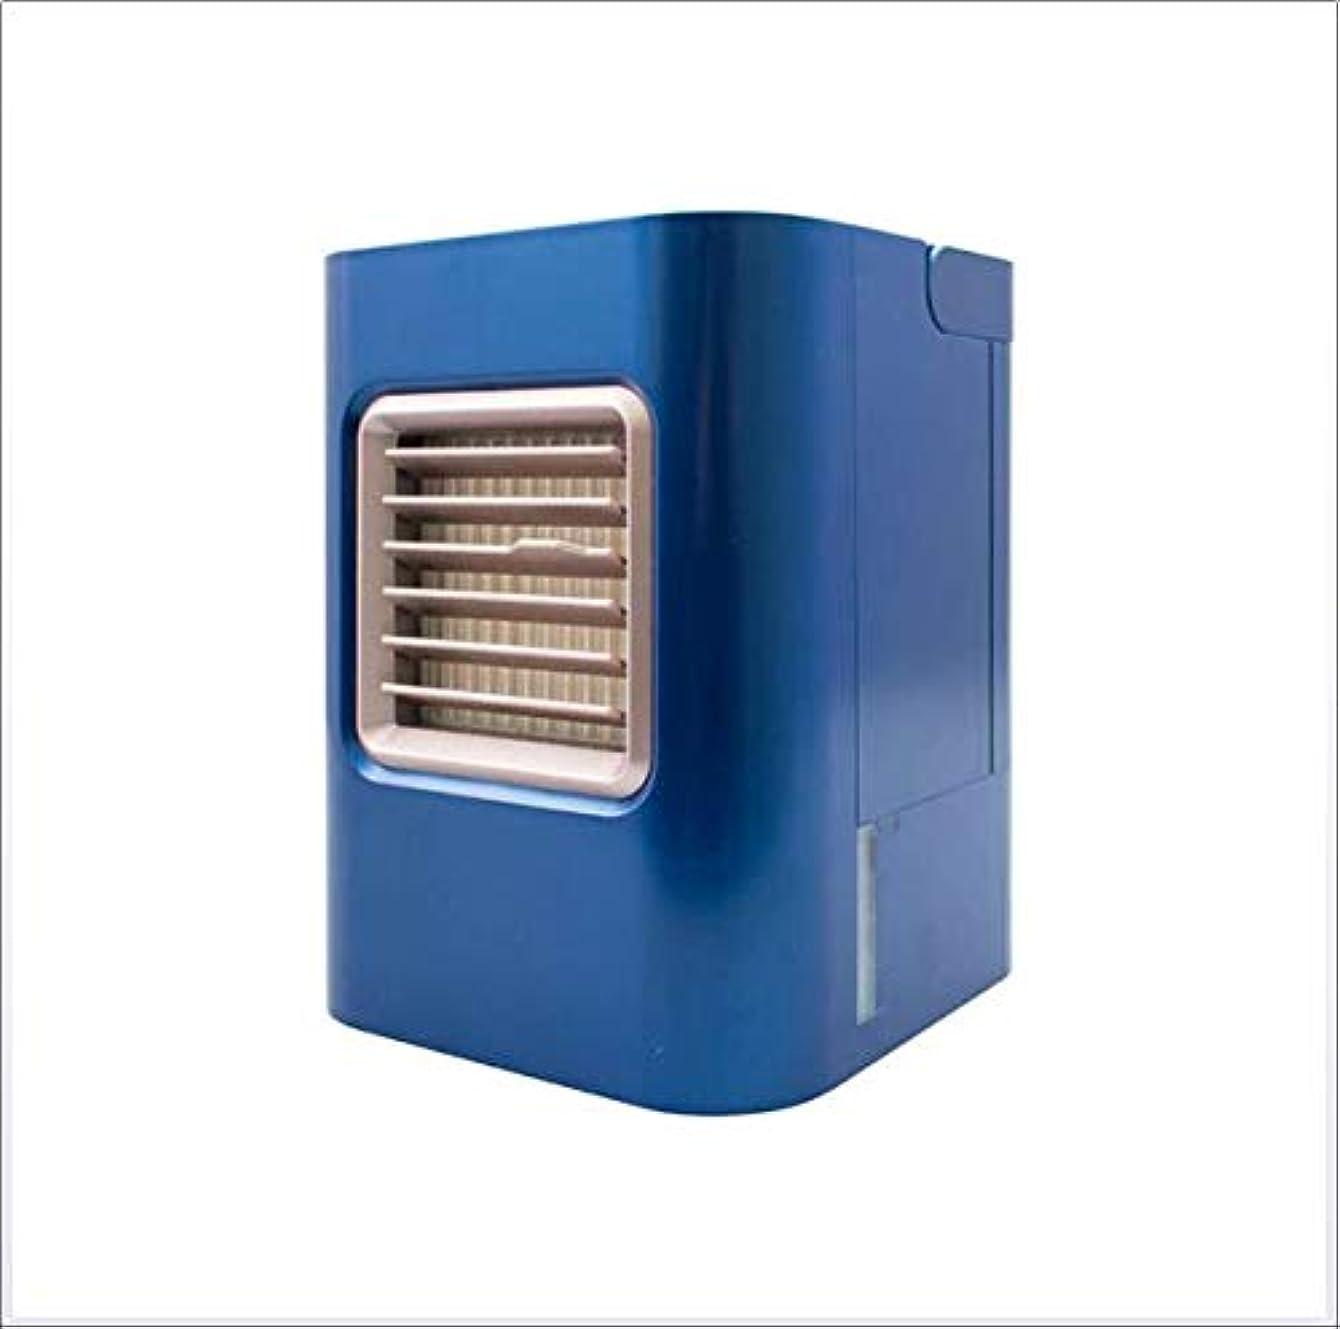 LBJ Portable Air Conditioner Chiller, Personal Air Cooler, USB, for Desktop Mini Evaporative Air Cooler, Air Conditioner Fan Cooler